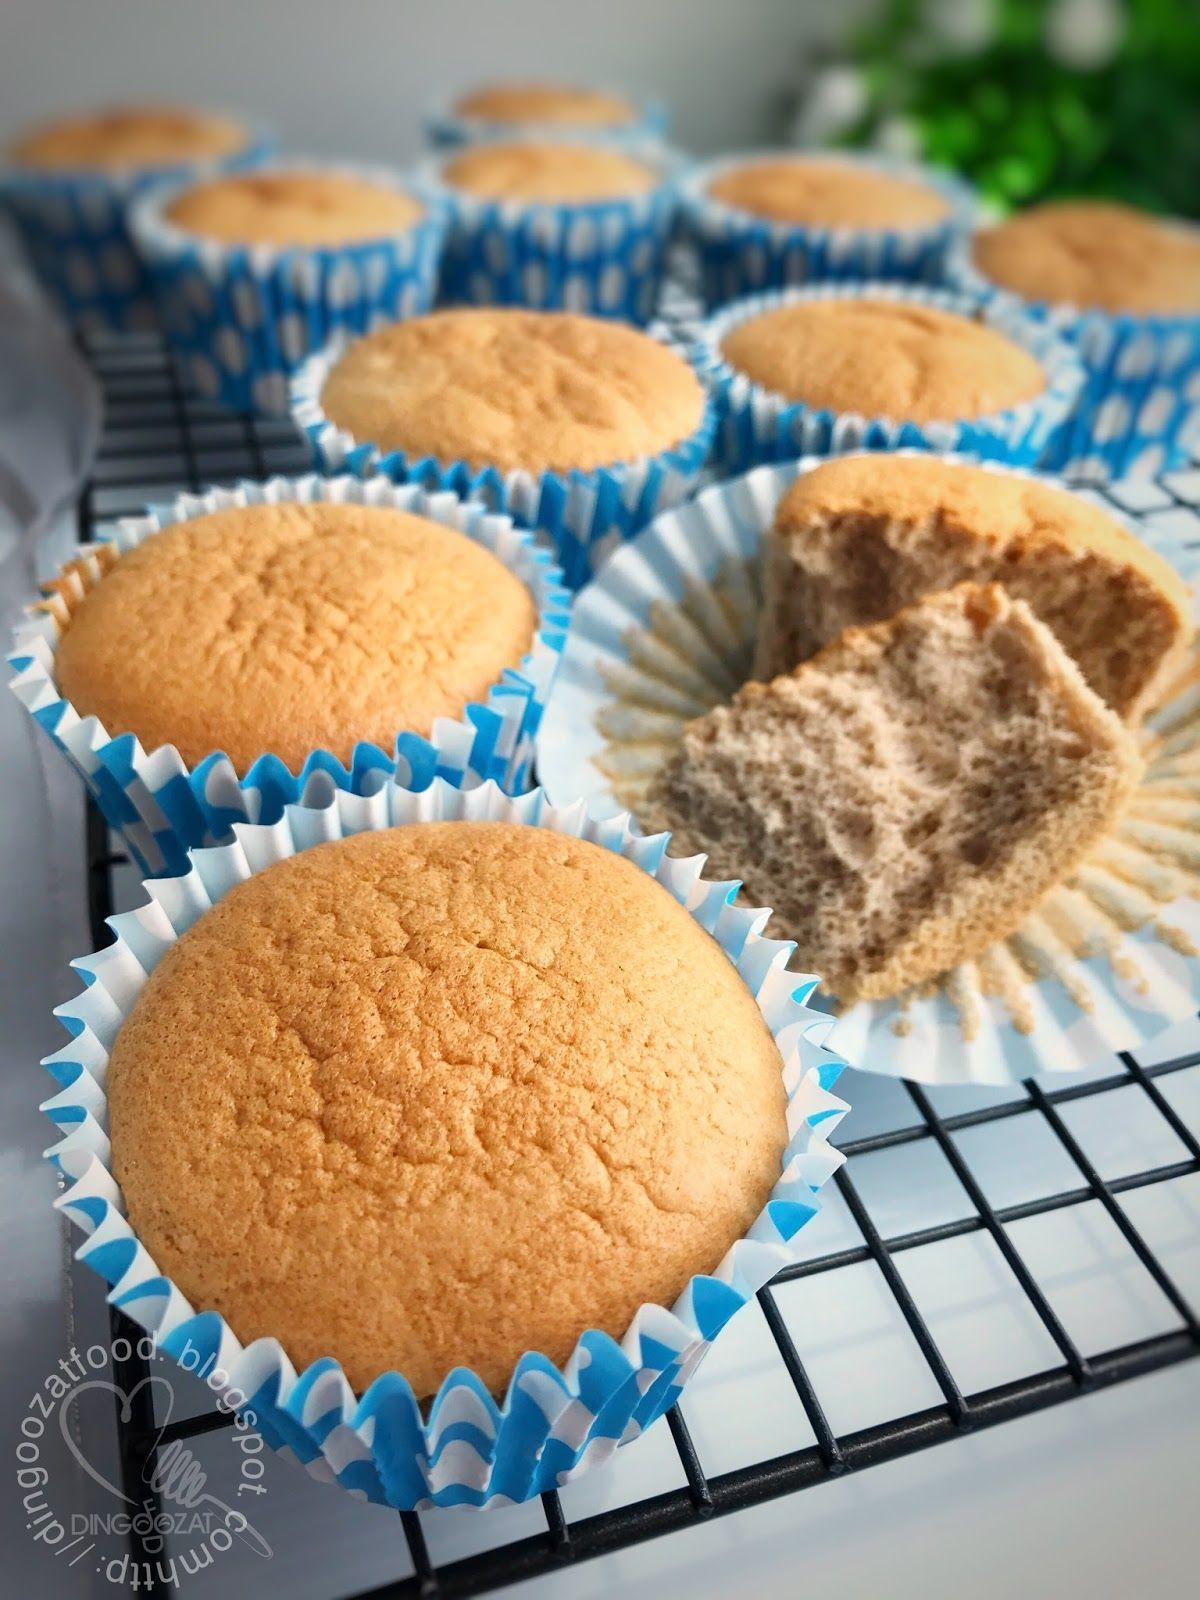 Dingoozat Mystery Cake (aka Milo Sponge Cake) 神秘蛋糕 -美禄海绵蛋糕 ...